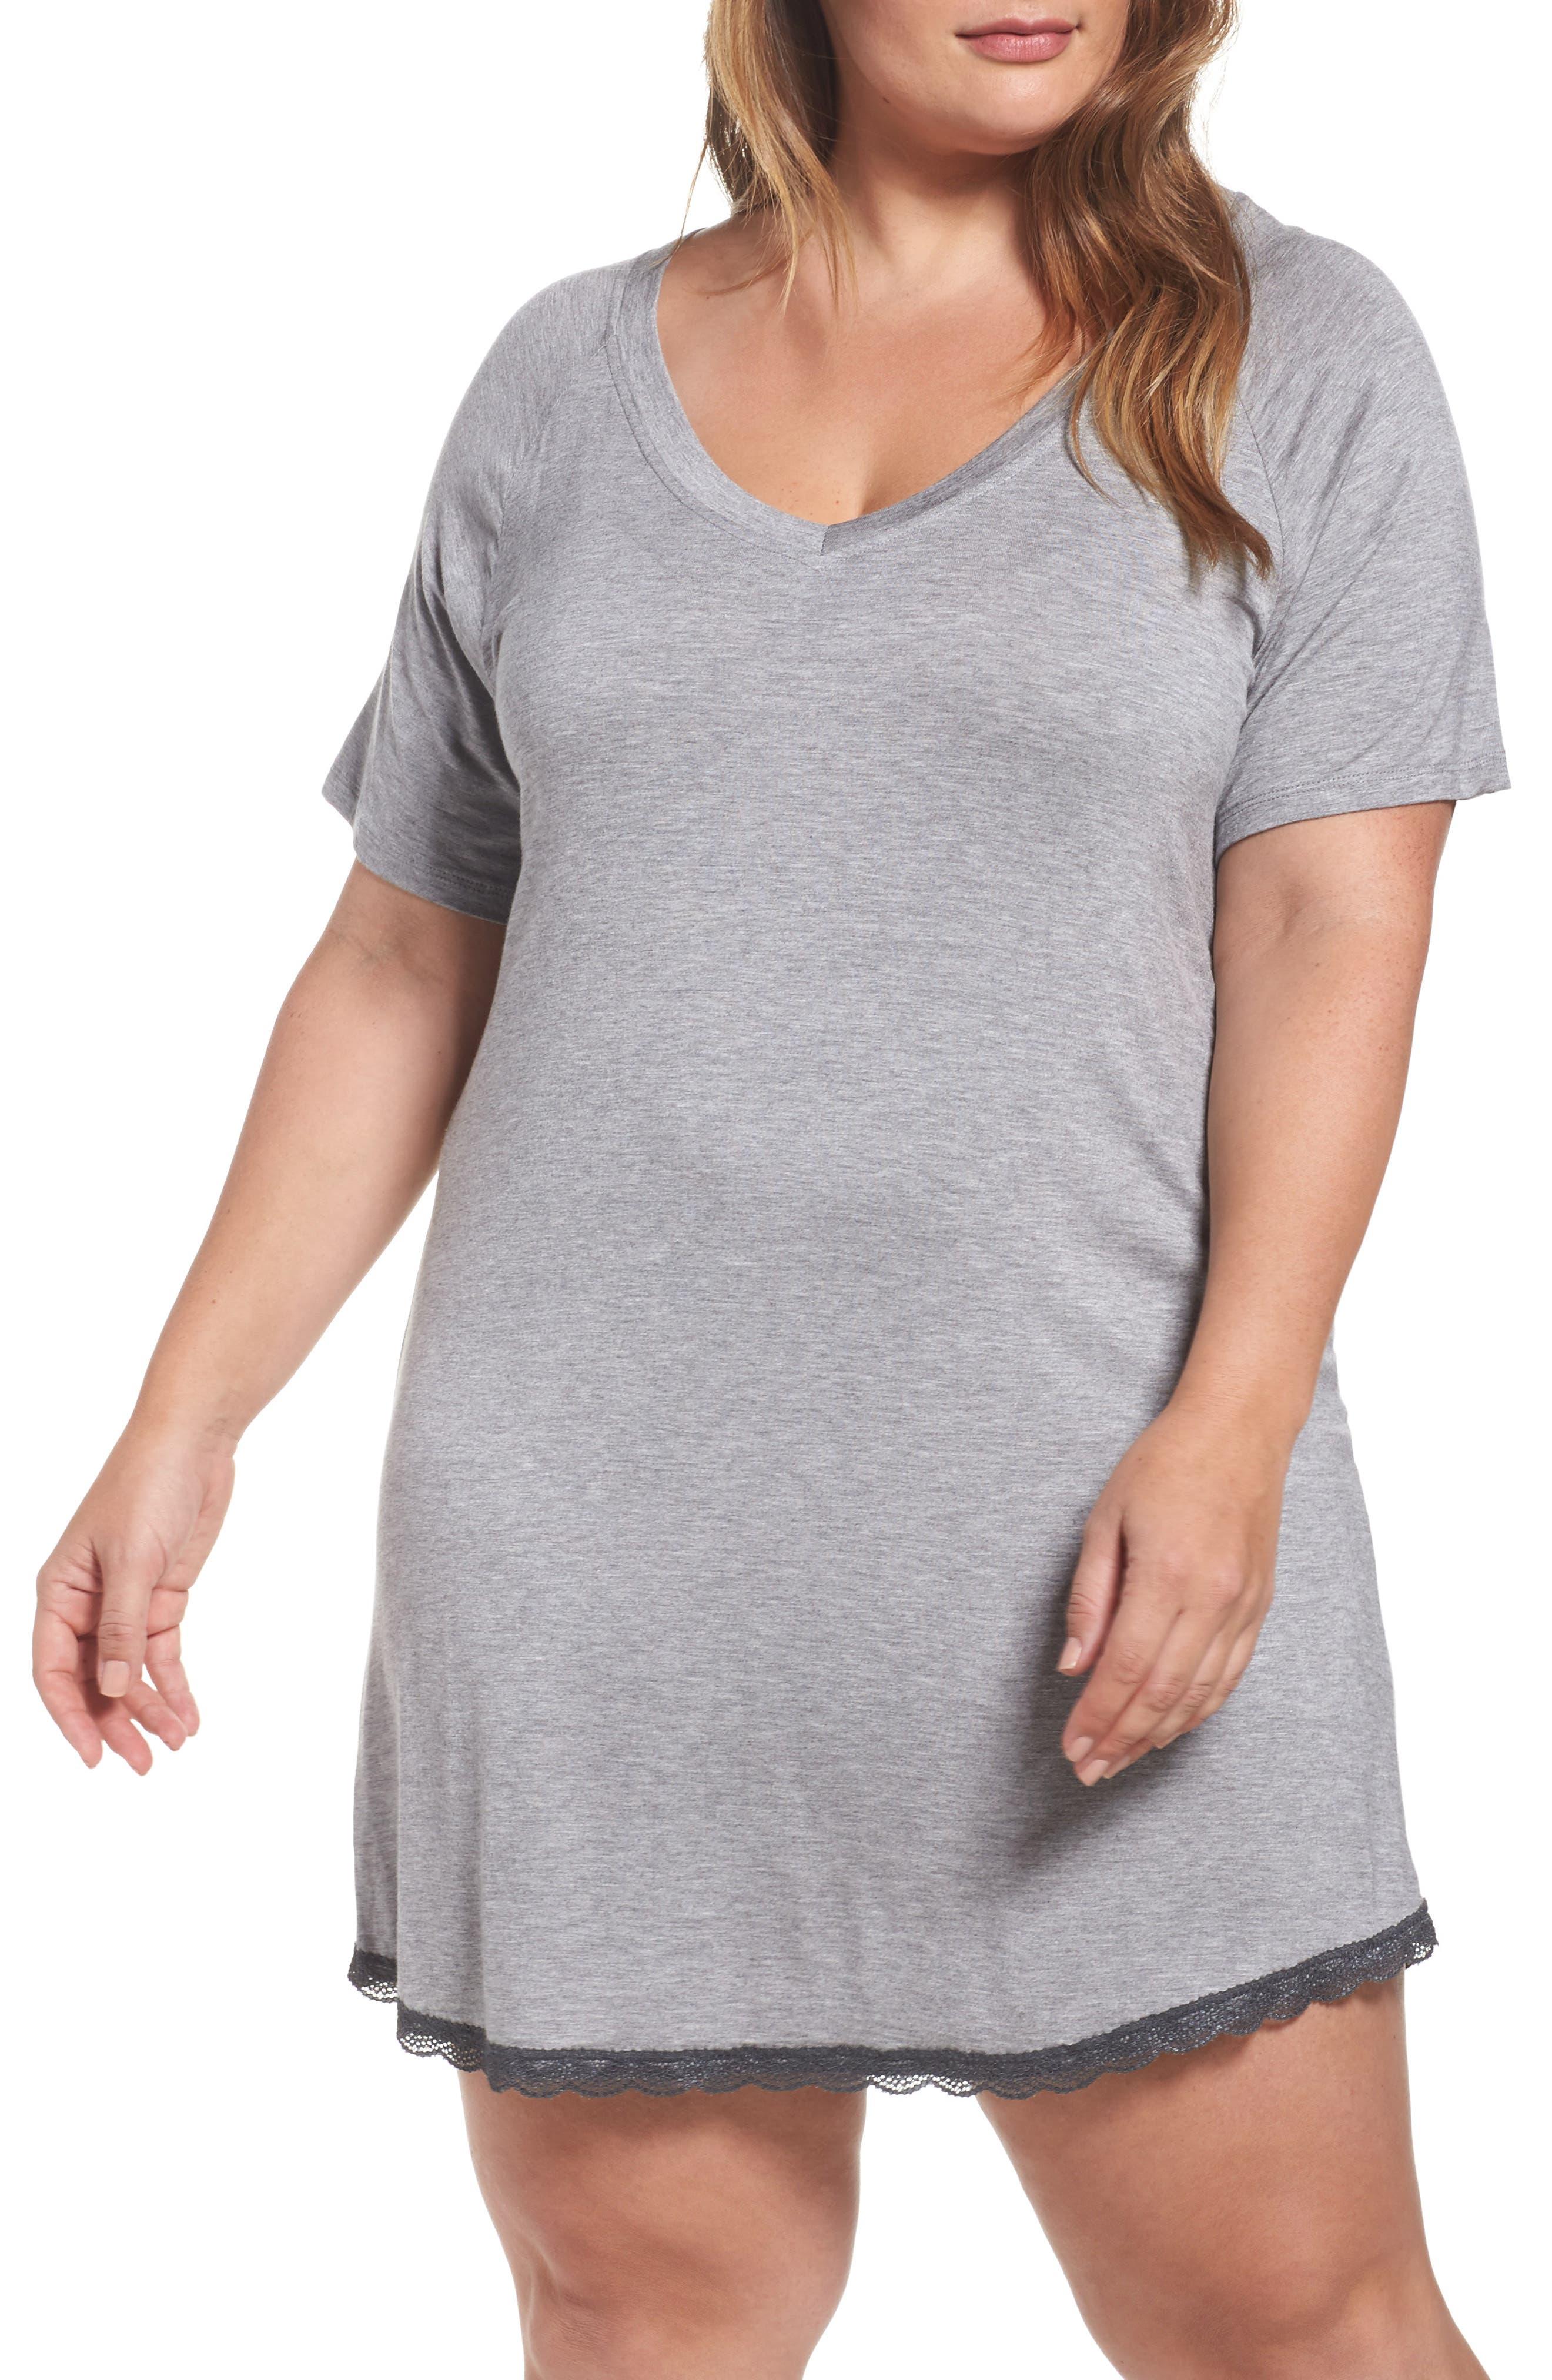 Alternate Image 1 Selected - Honeydew Lace Trim Sleep Shirt (Plus Size) (2 for $60)